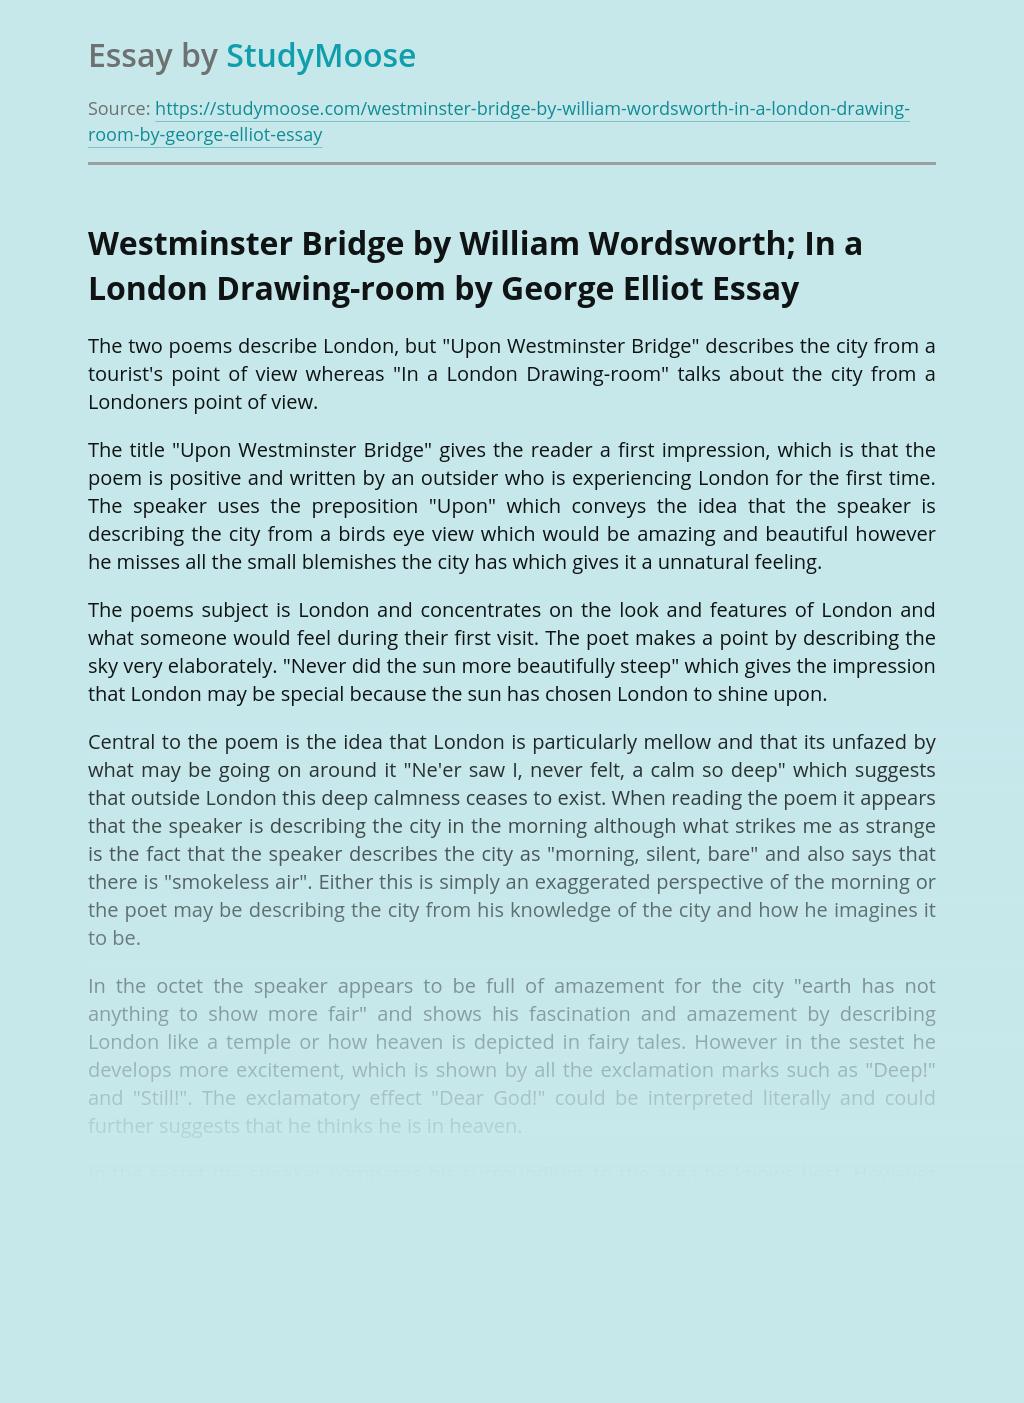 Westminster Bridge by William Wordsworth; In a London Drawing-room by George Elliot